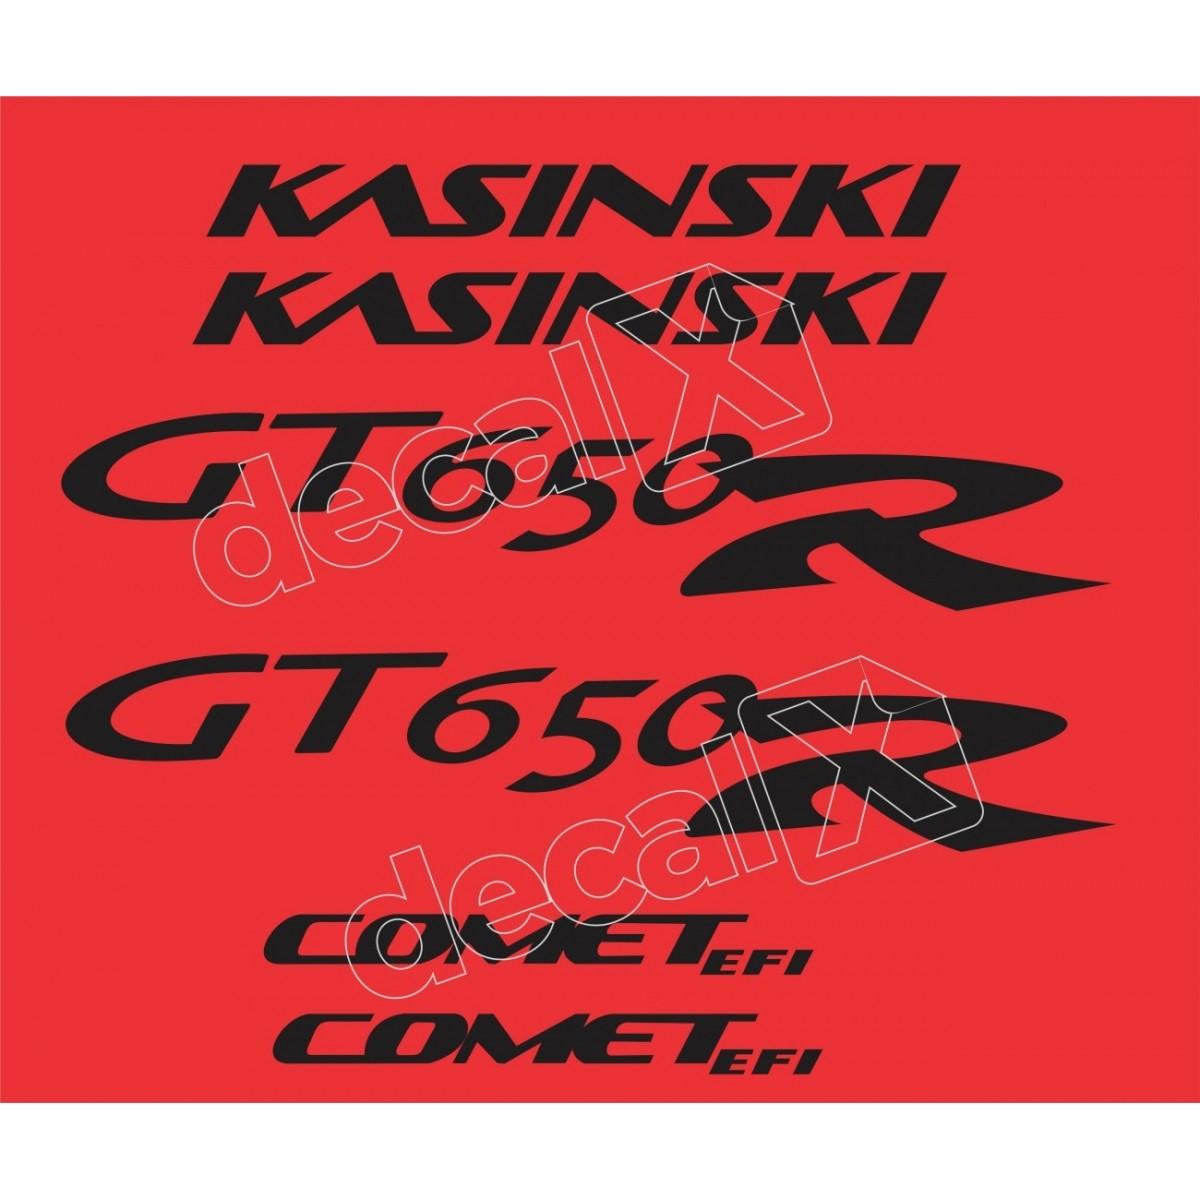 Kit Adesivos Kasinski Comet Gt 650r Em Preto Decalx